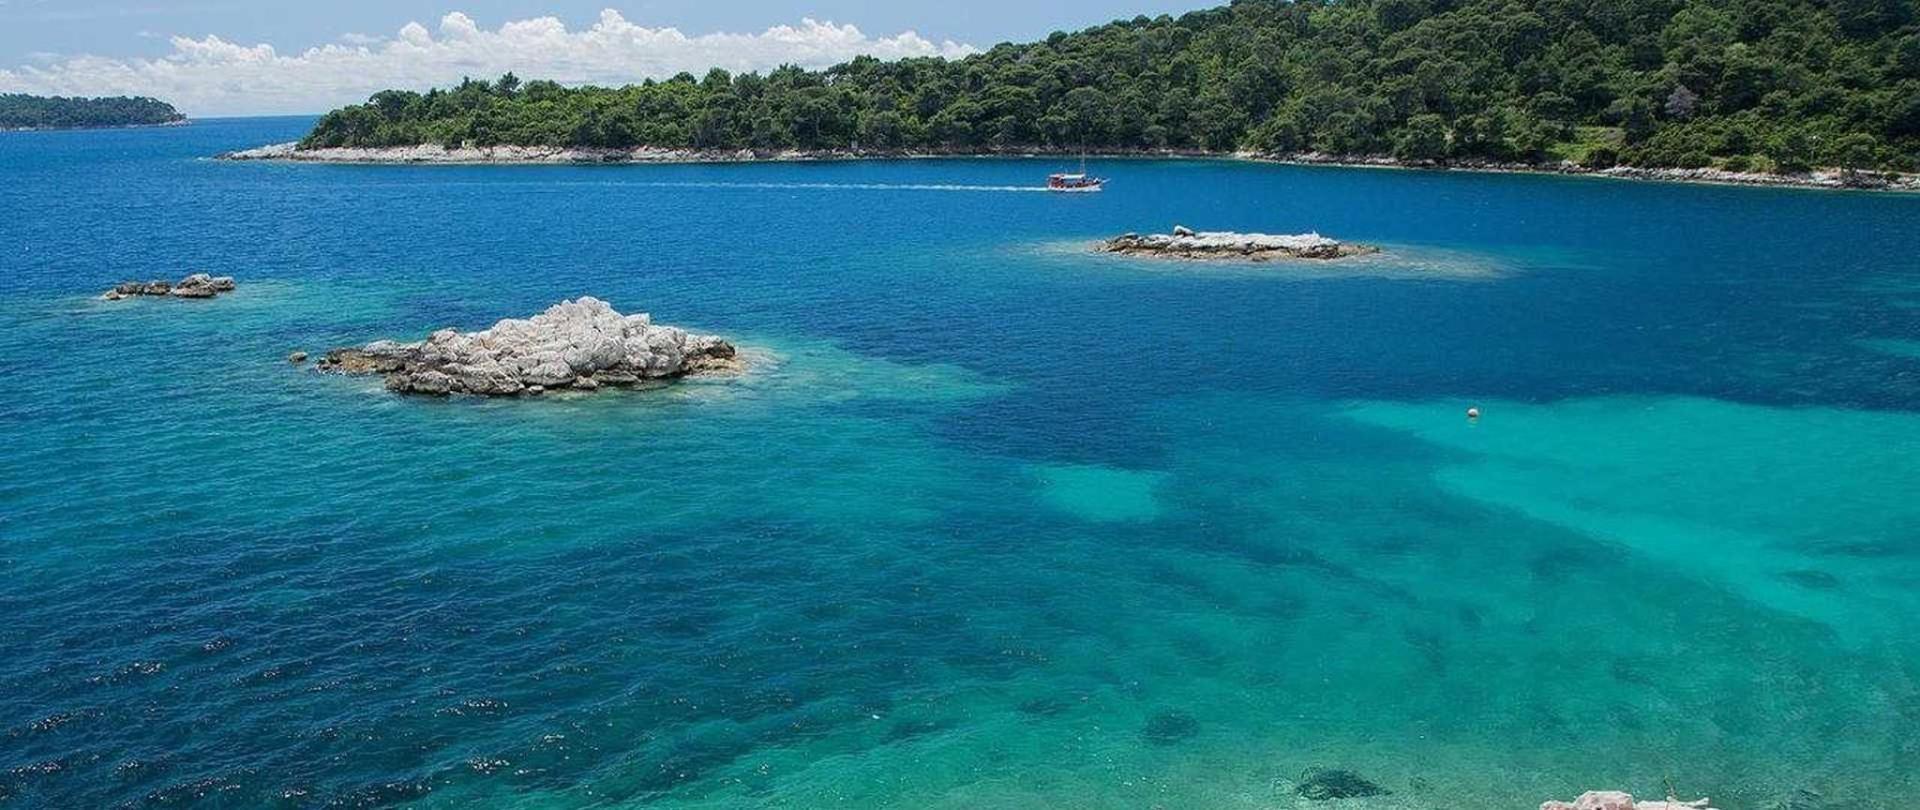 Hotel Bozica Dubrovnik Islands